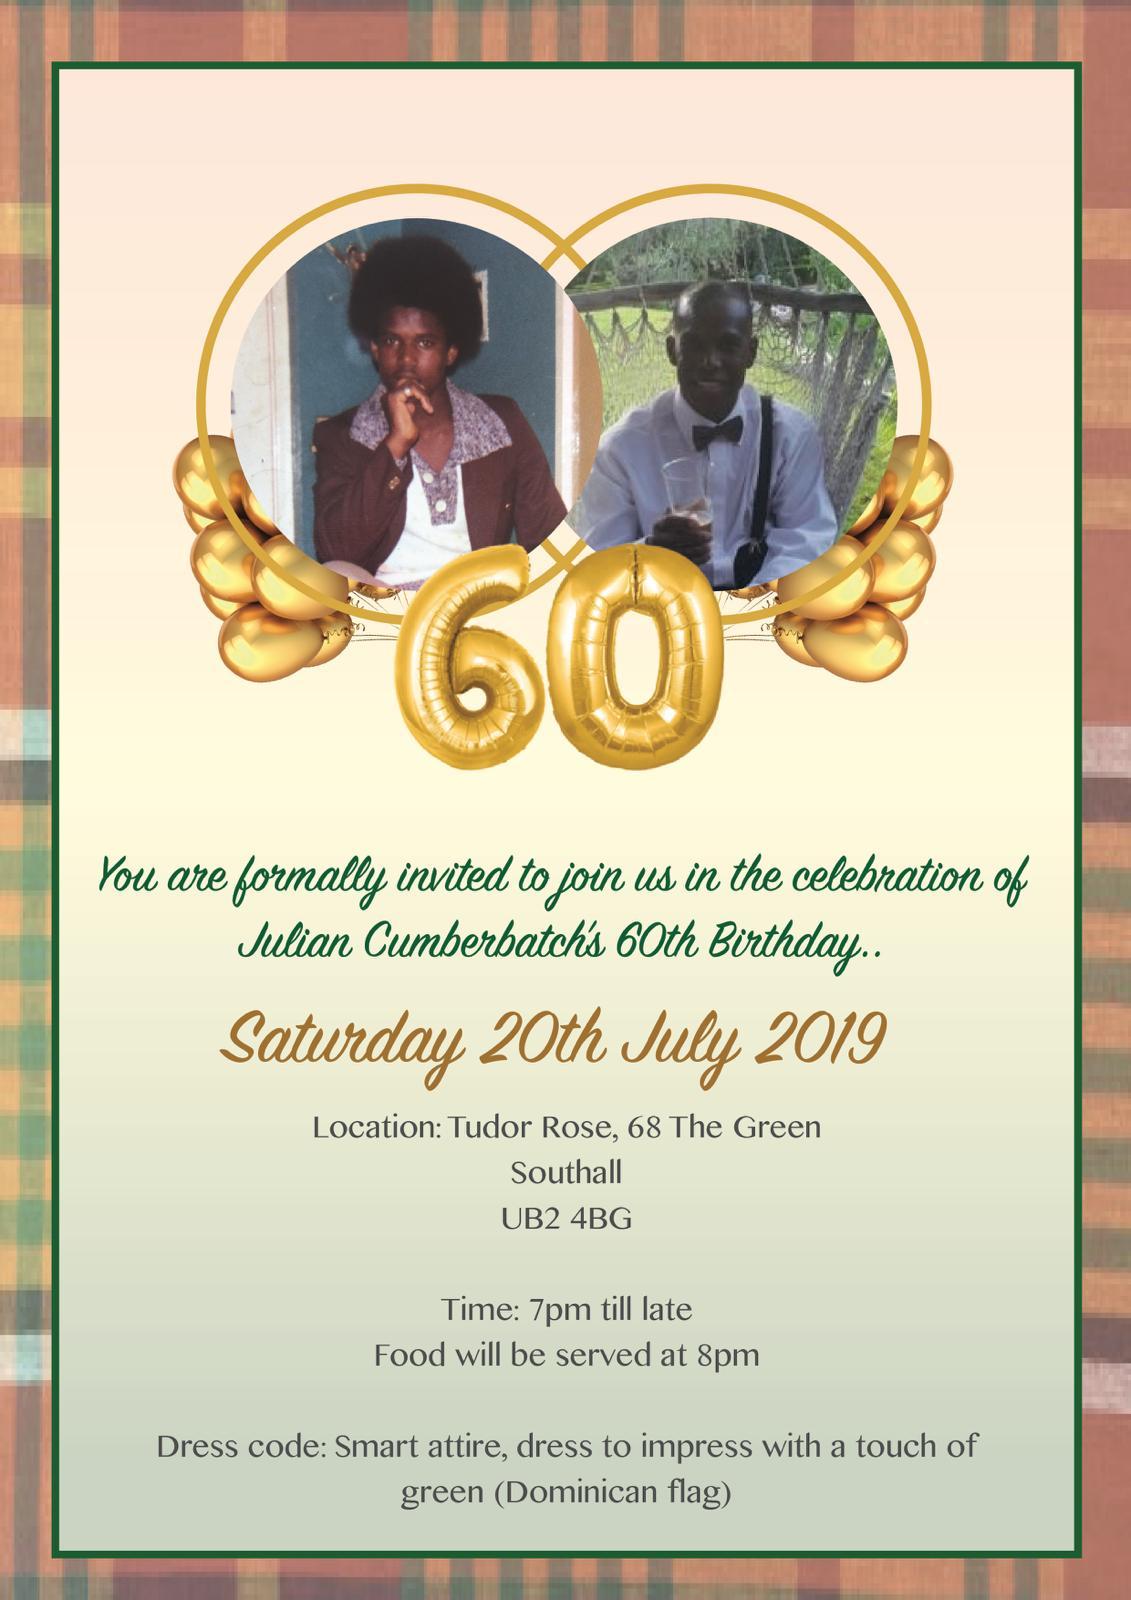 Julian Cumberbatch's 60th Birthday 1